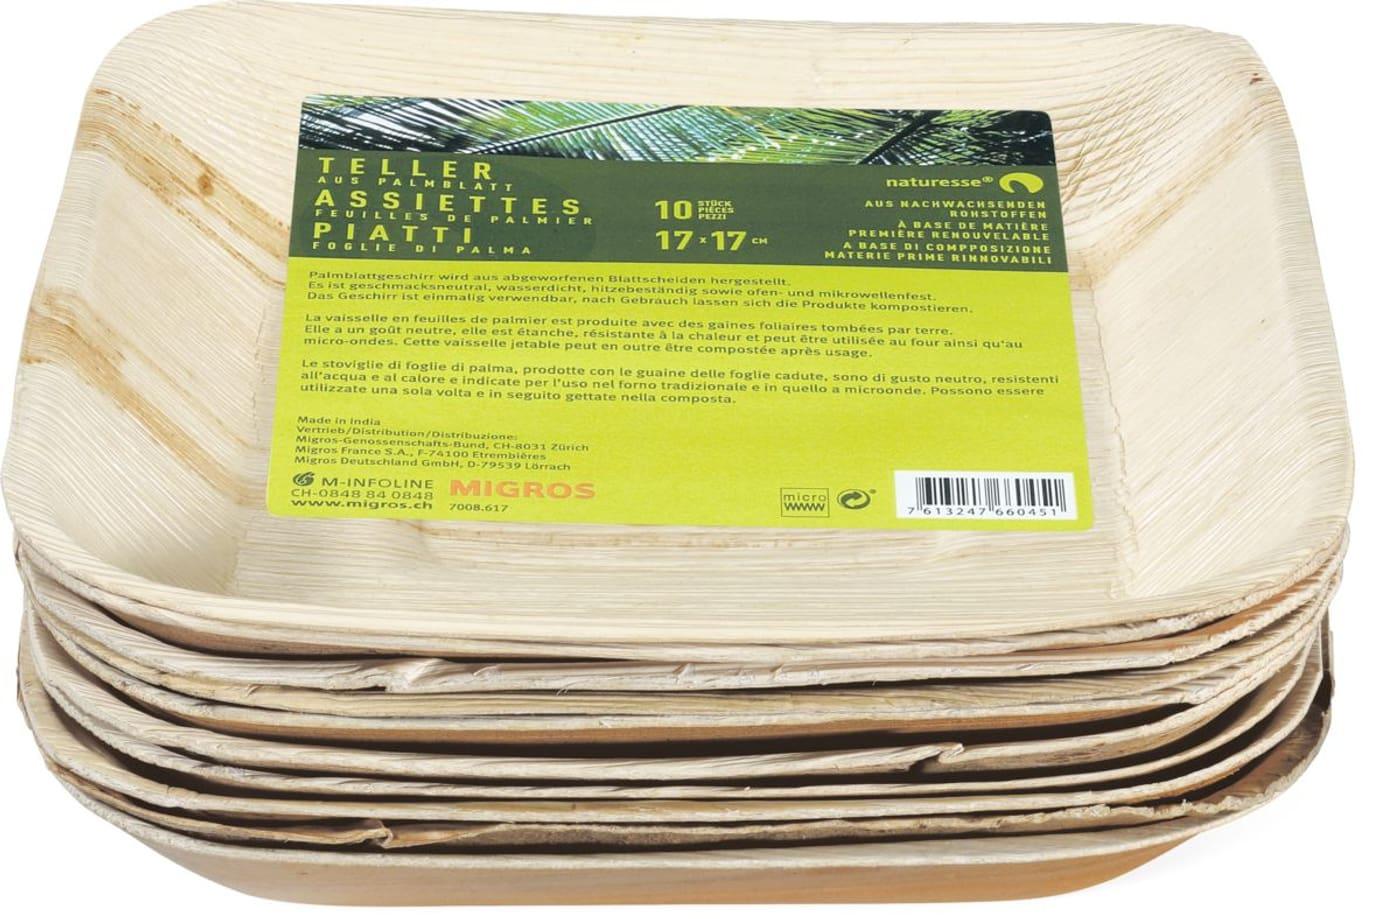 Cucina Tavola Palmblatt Teller Naturesse Migros